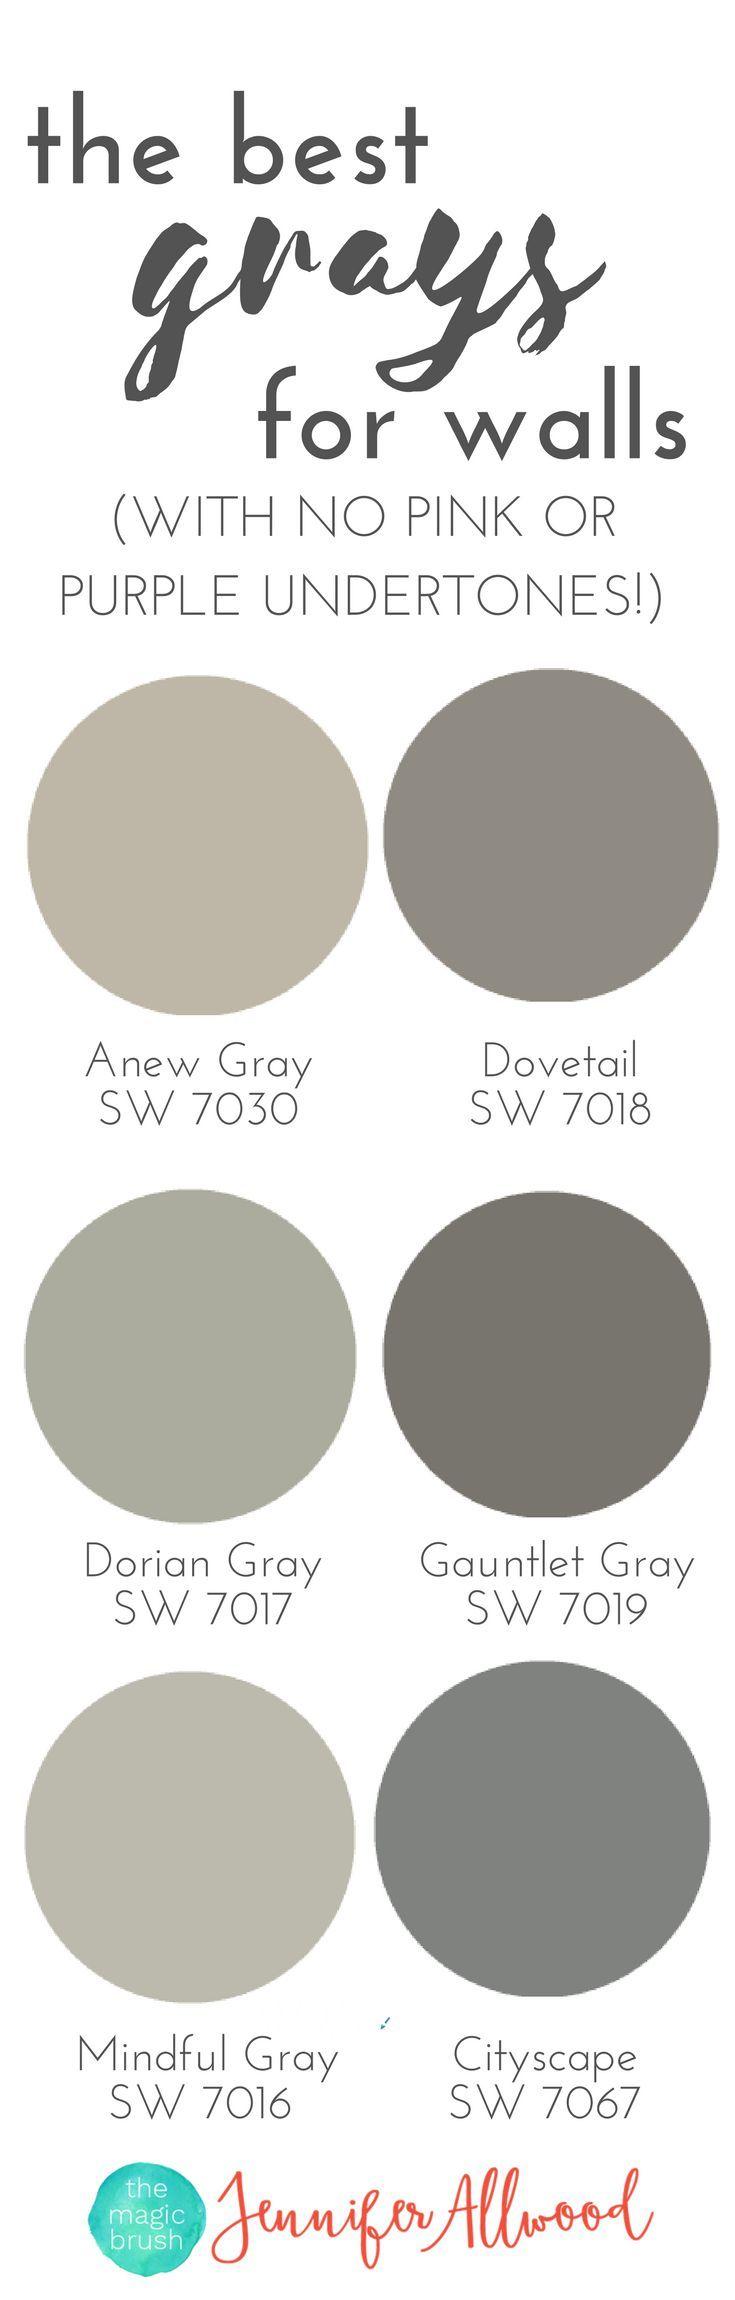 best gray paint colors for living room. the best Gray Paint Colors for walls with no pink or purple undertones  Magic Brush Best 25 paint colors ideas on Pinterest by